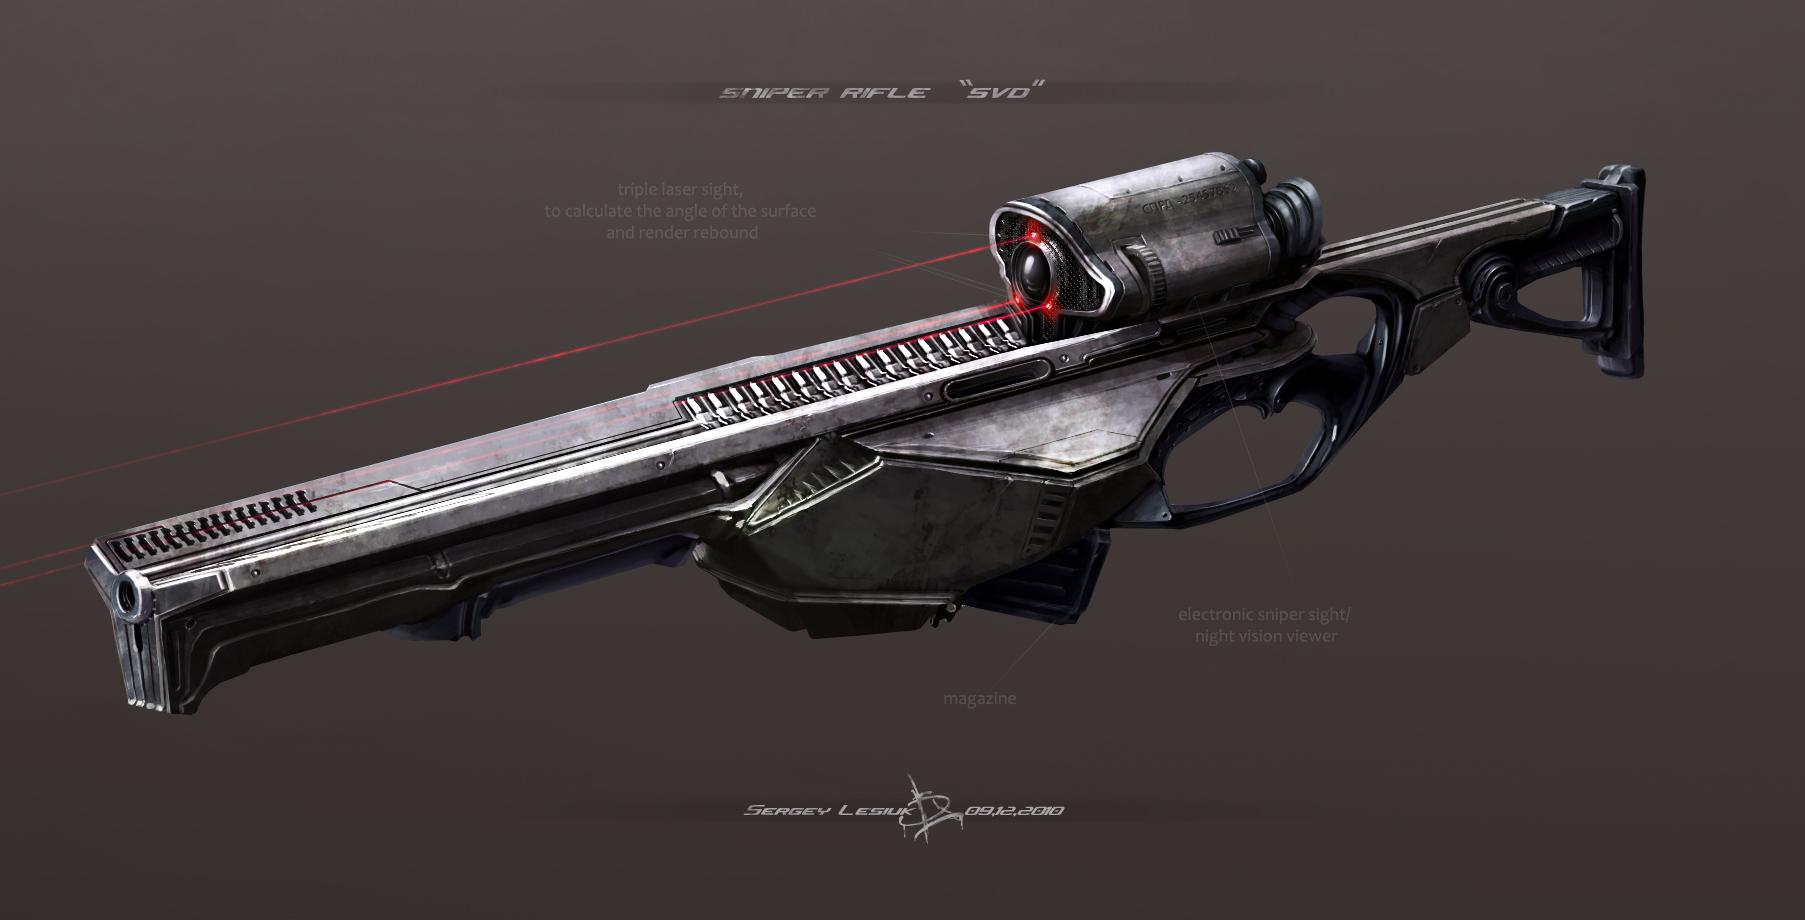 sniper rifle SVD by Sergey-Lesiuk